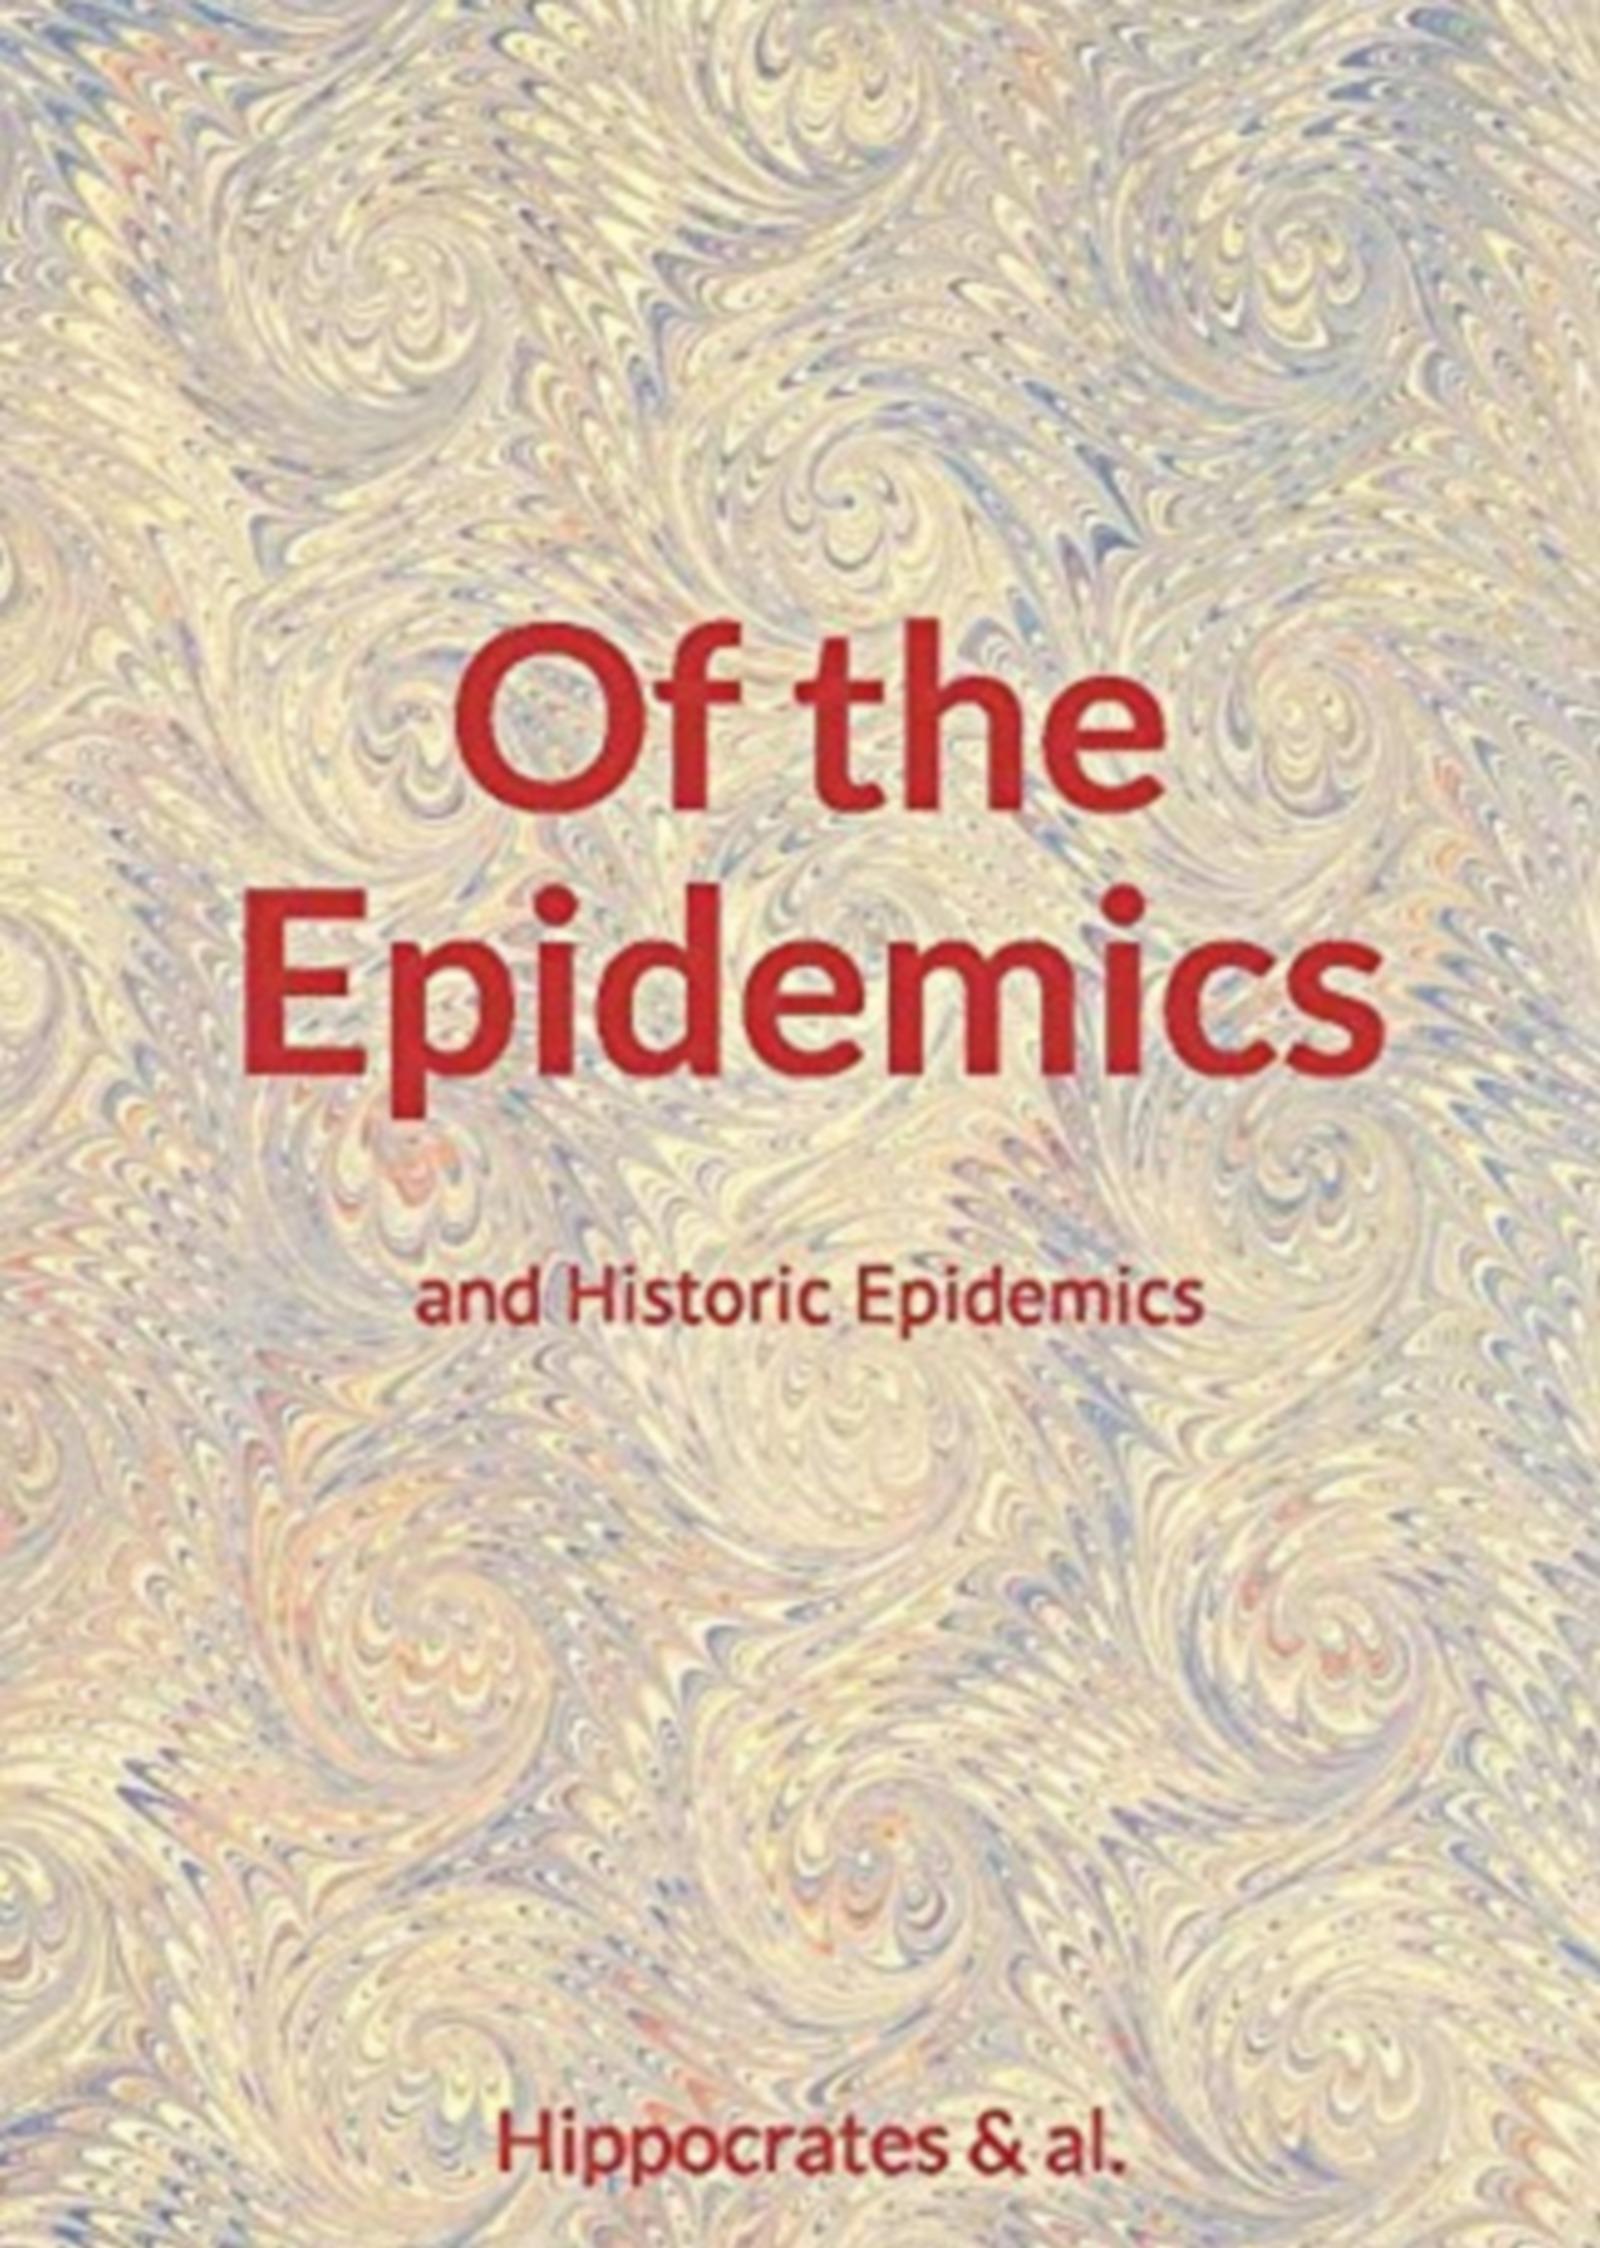 Of the Epidemics - and Historic Epidemics